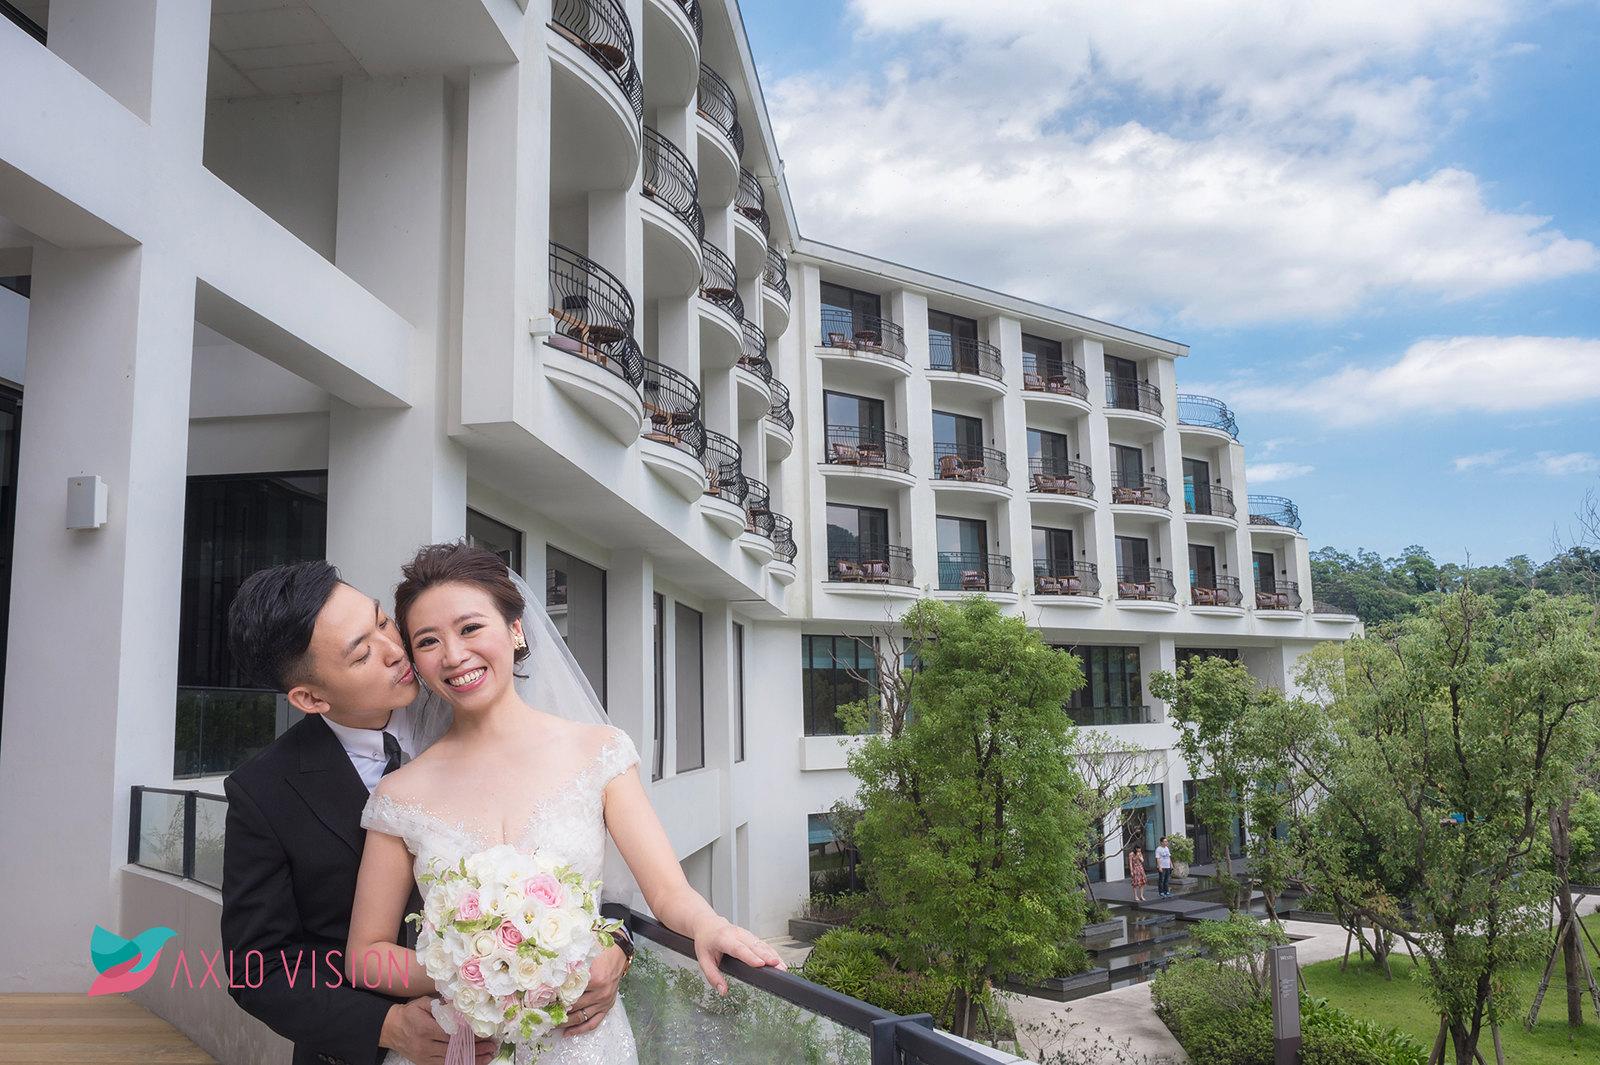 20170916 WeddingDay_090